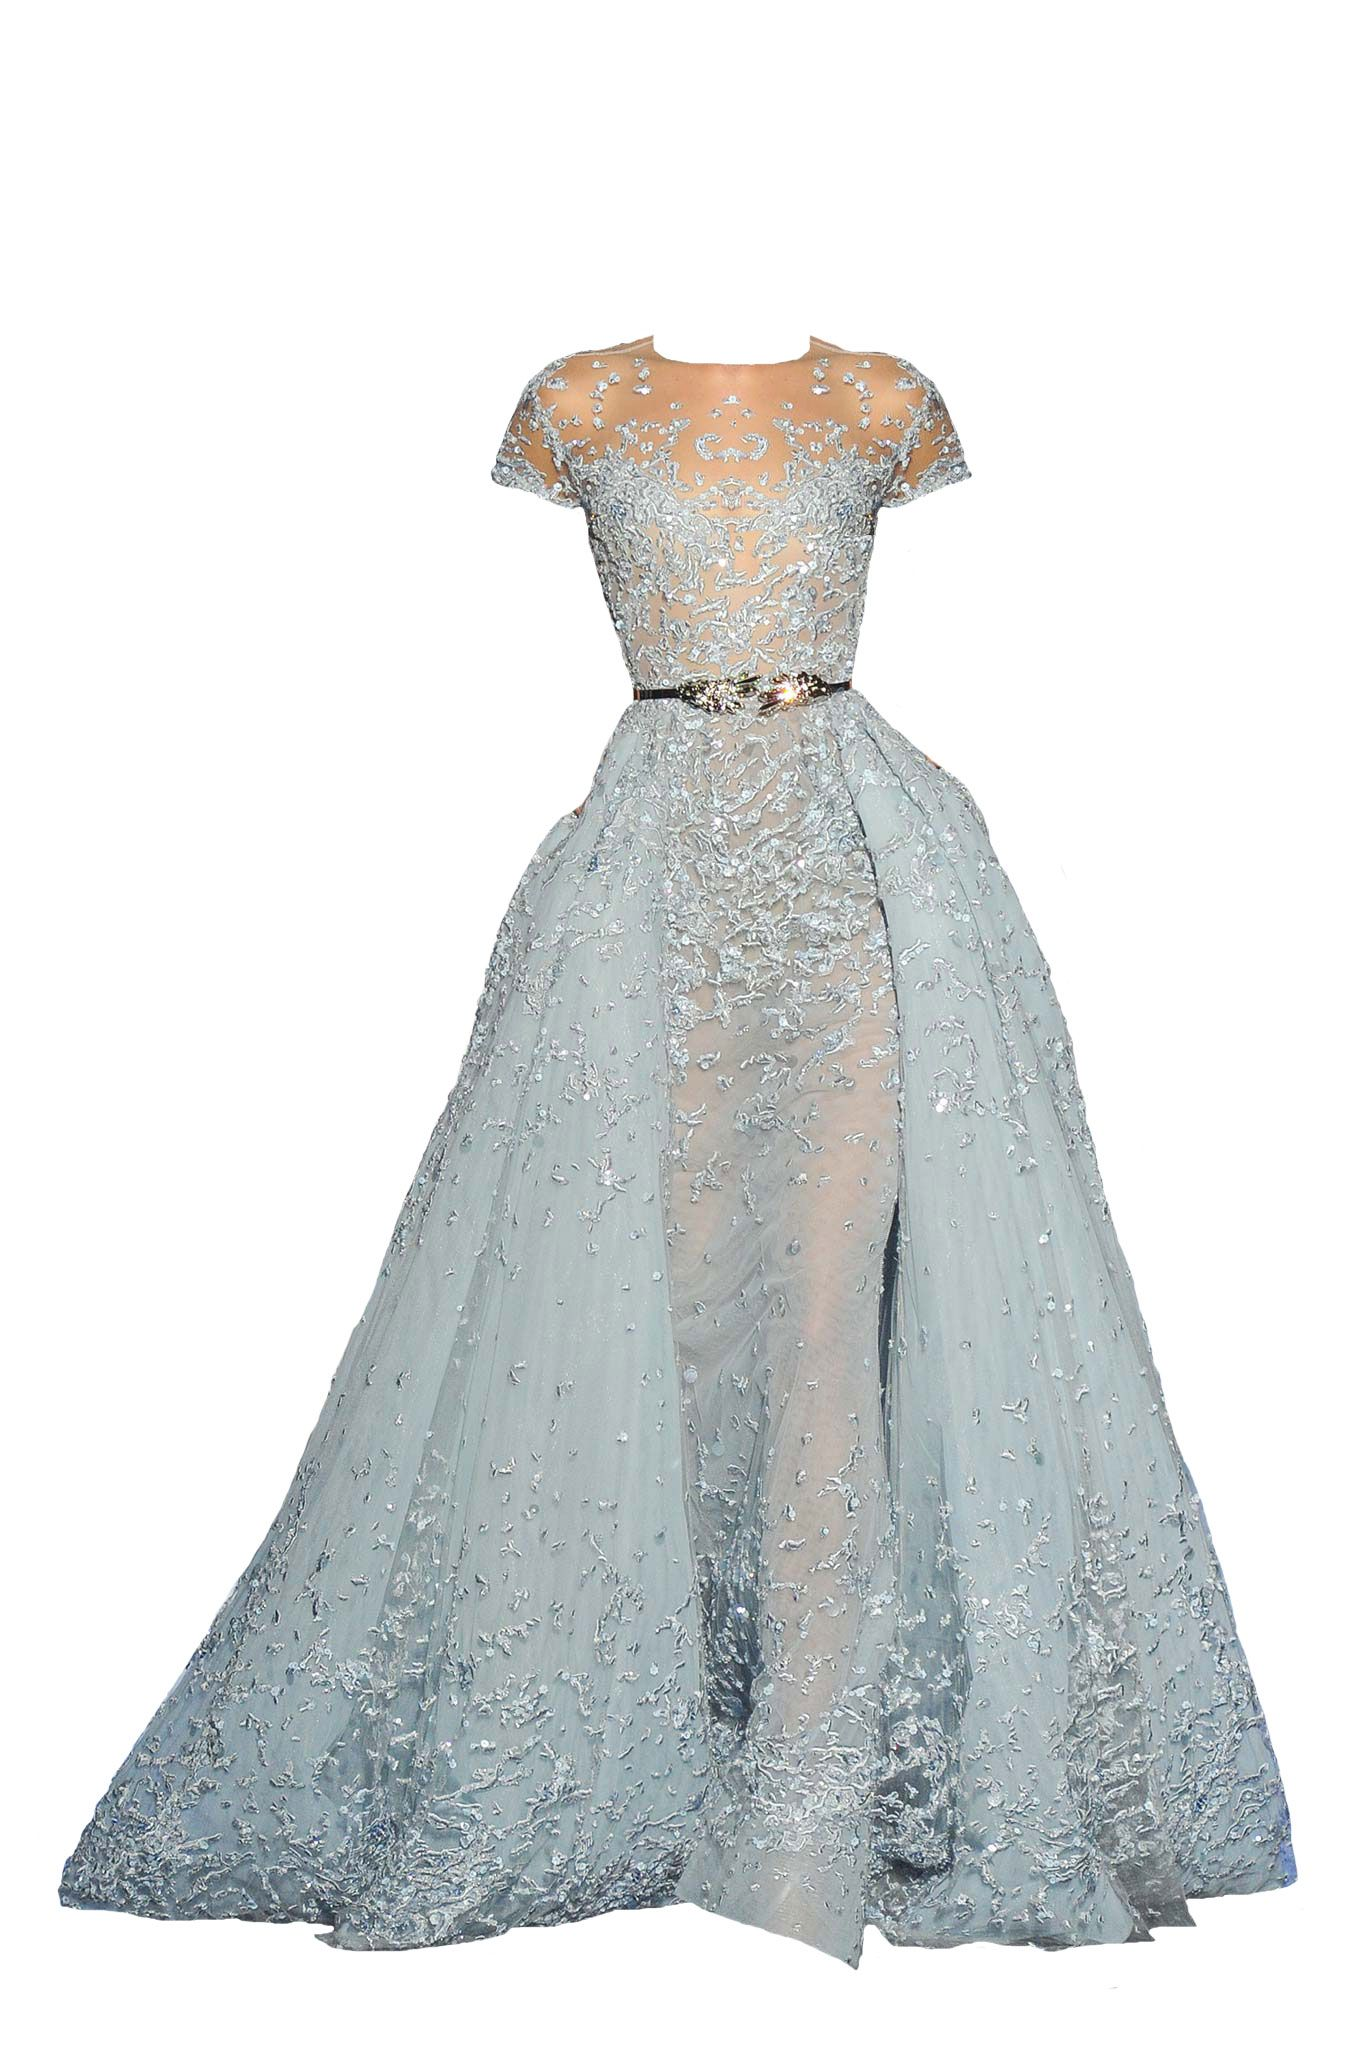 Polyvore Moodboard Filler Gown Dress Blue Orange Fancy Dresses Event Dresses Gorgeous Dresses